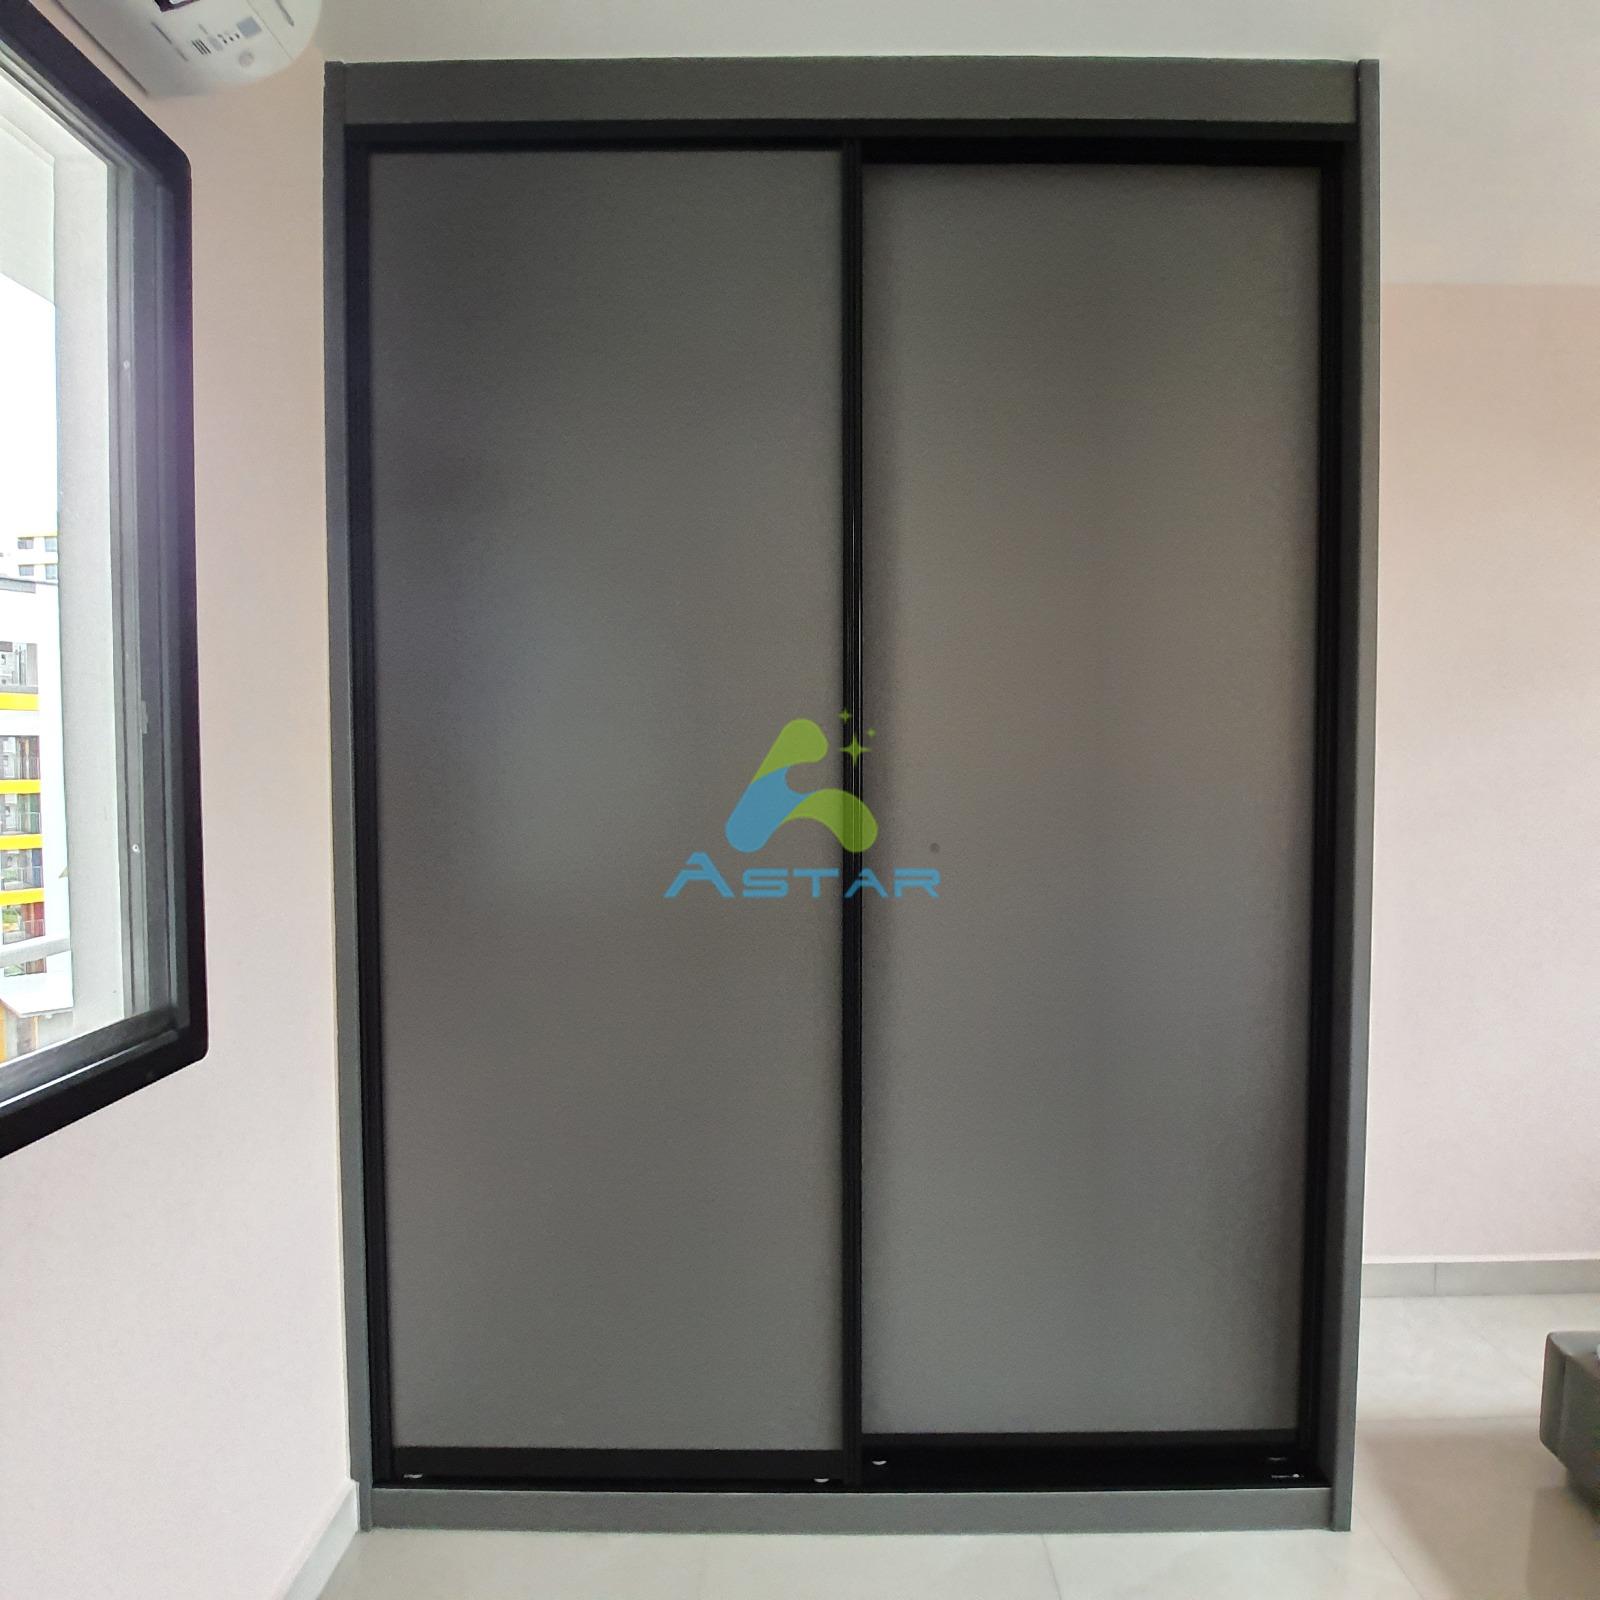 a star furnishing projects Blk 478A Yishun St 44 08